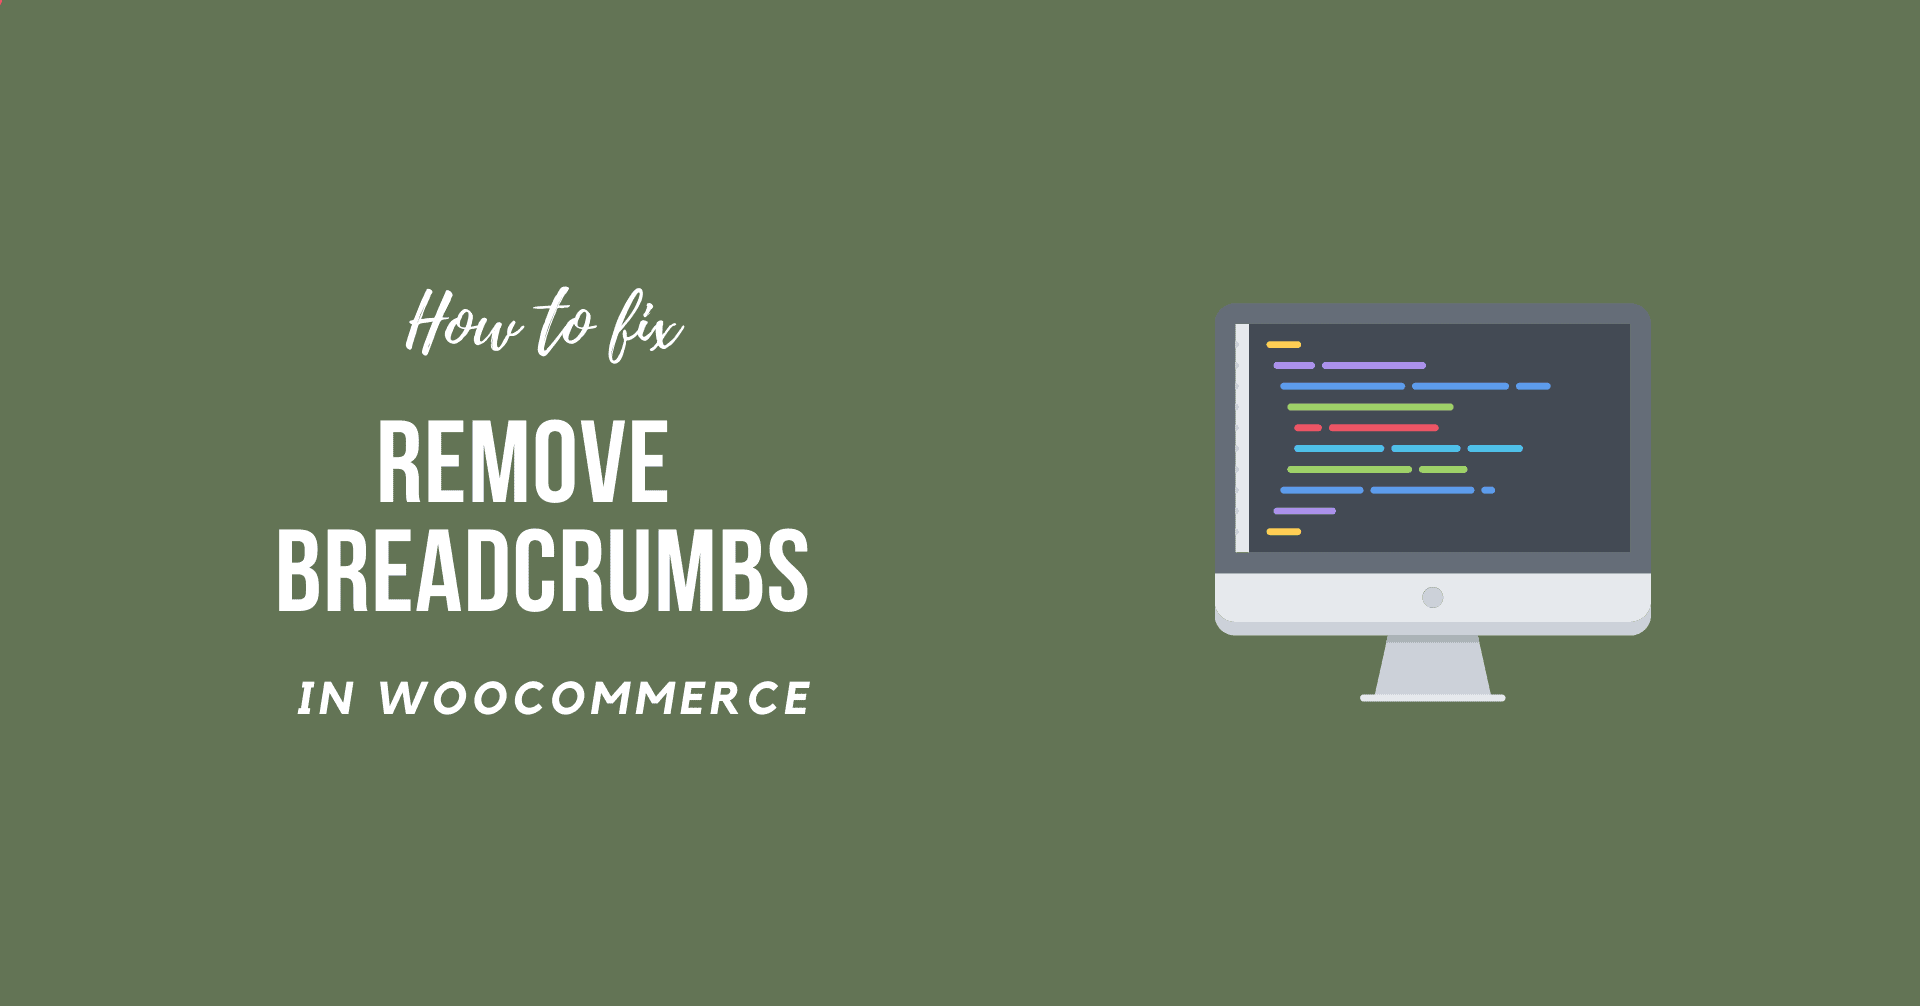 How to Remove WooCommerce Breadcrumbs